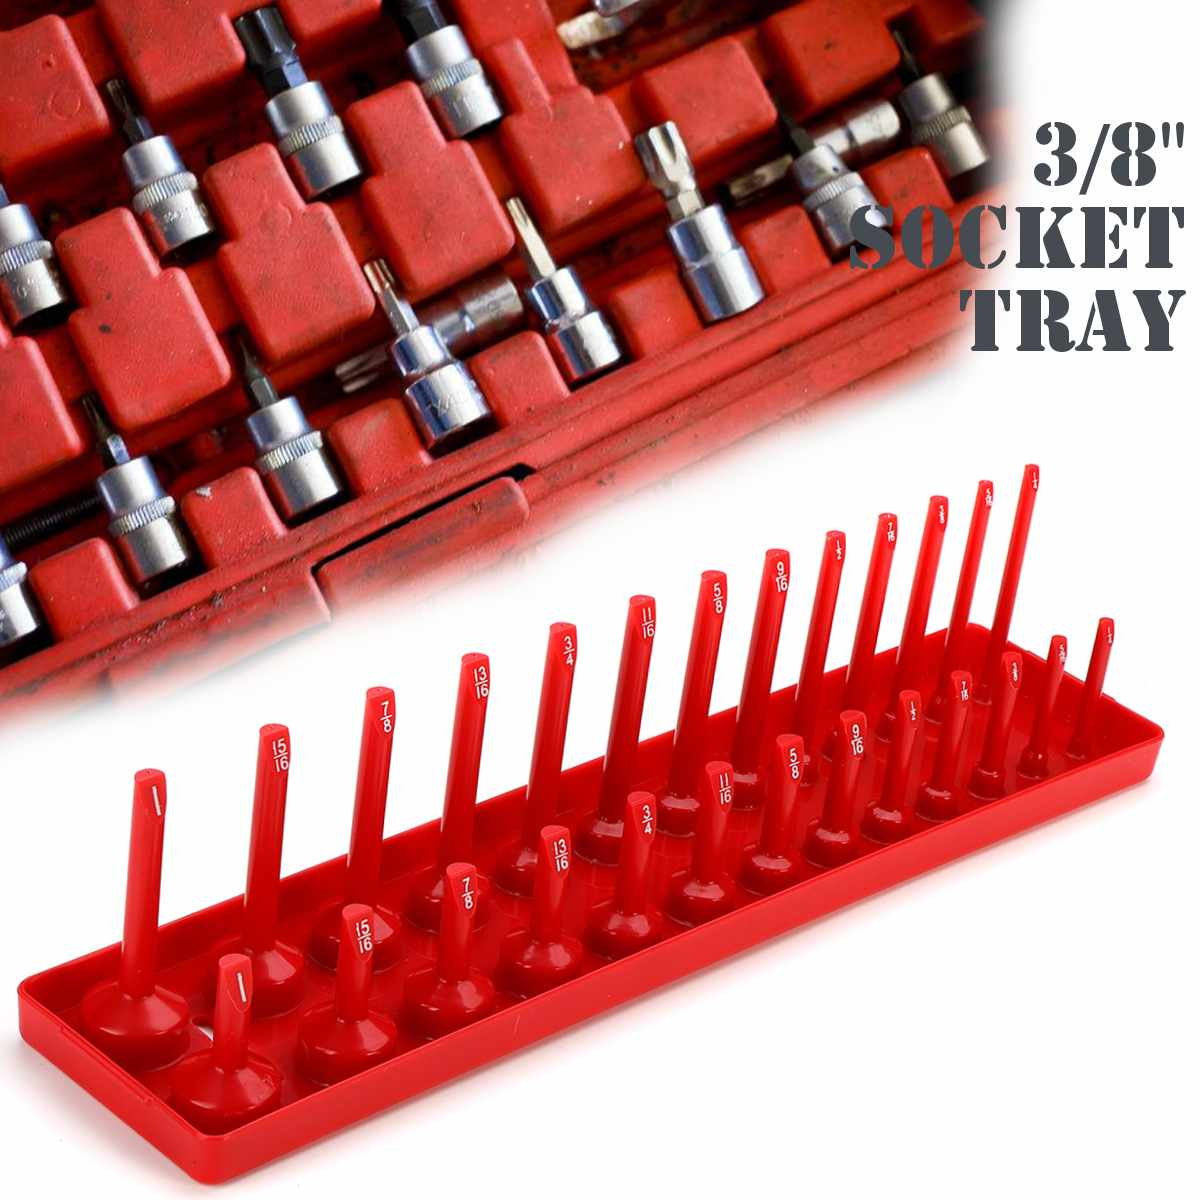 Doersupp 3/8 Sae Deep Standard 26 Sockets Socket Organizer Socket Tray Rack Molded Plastic Tray Hand Tools Hand Tools